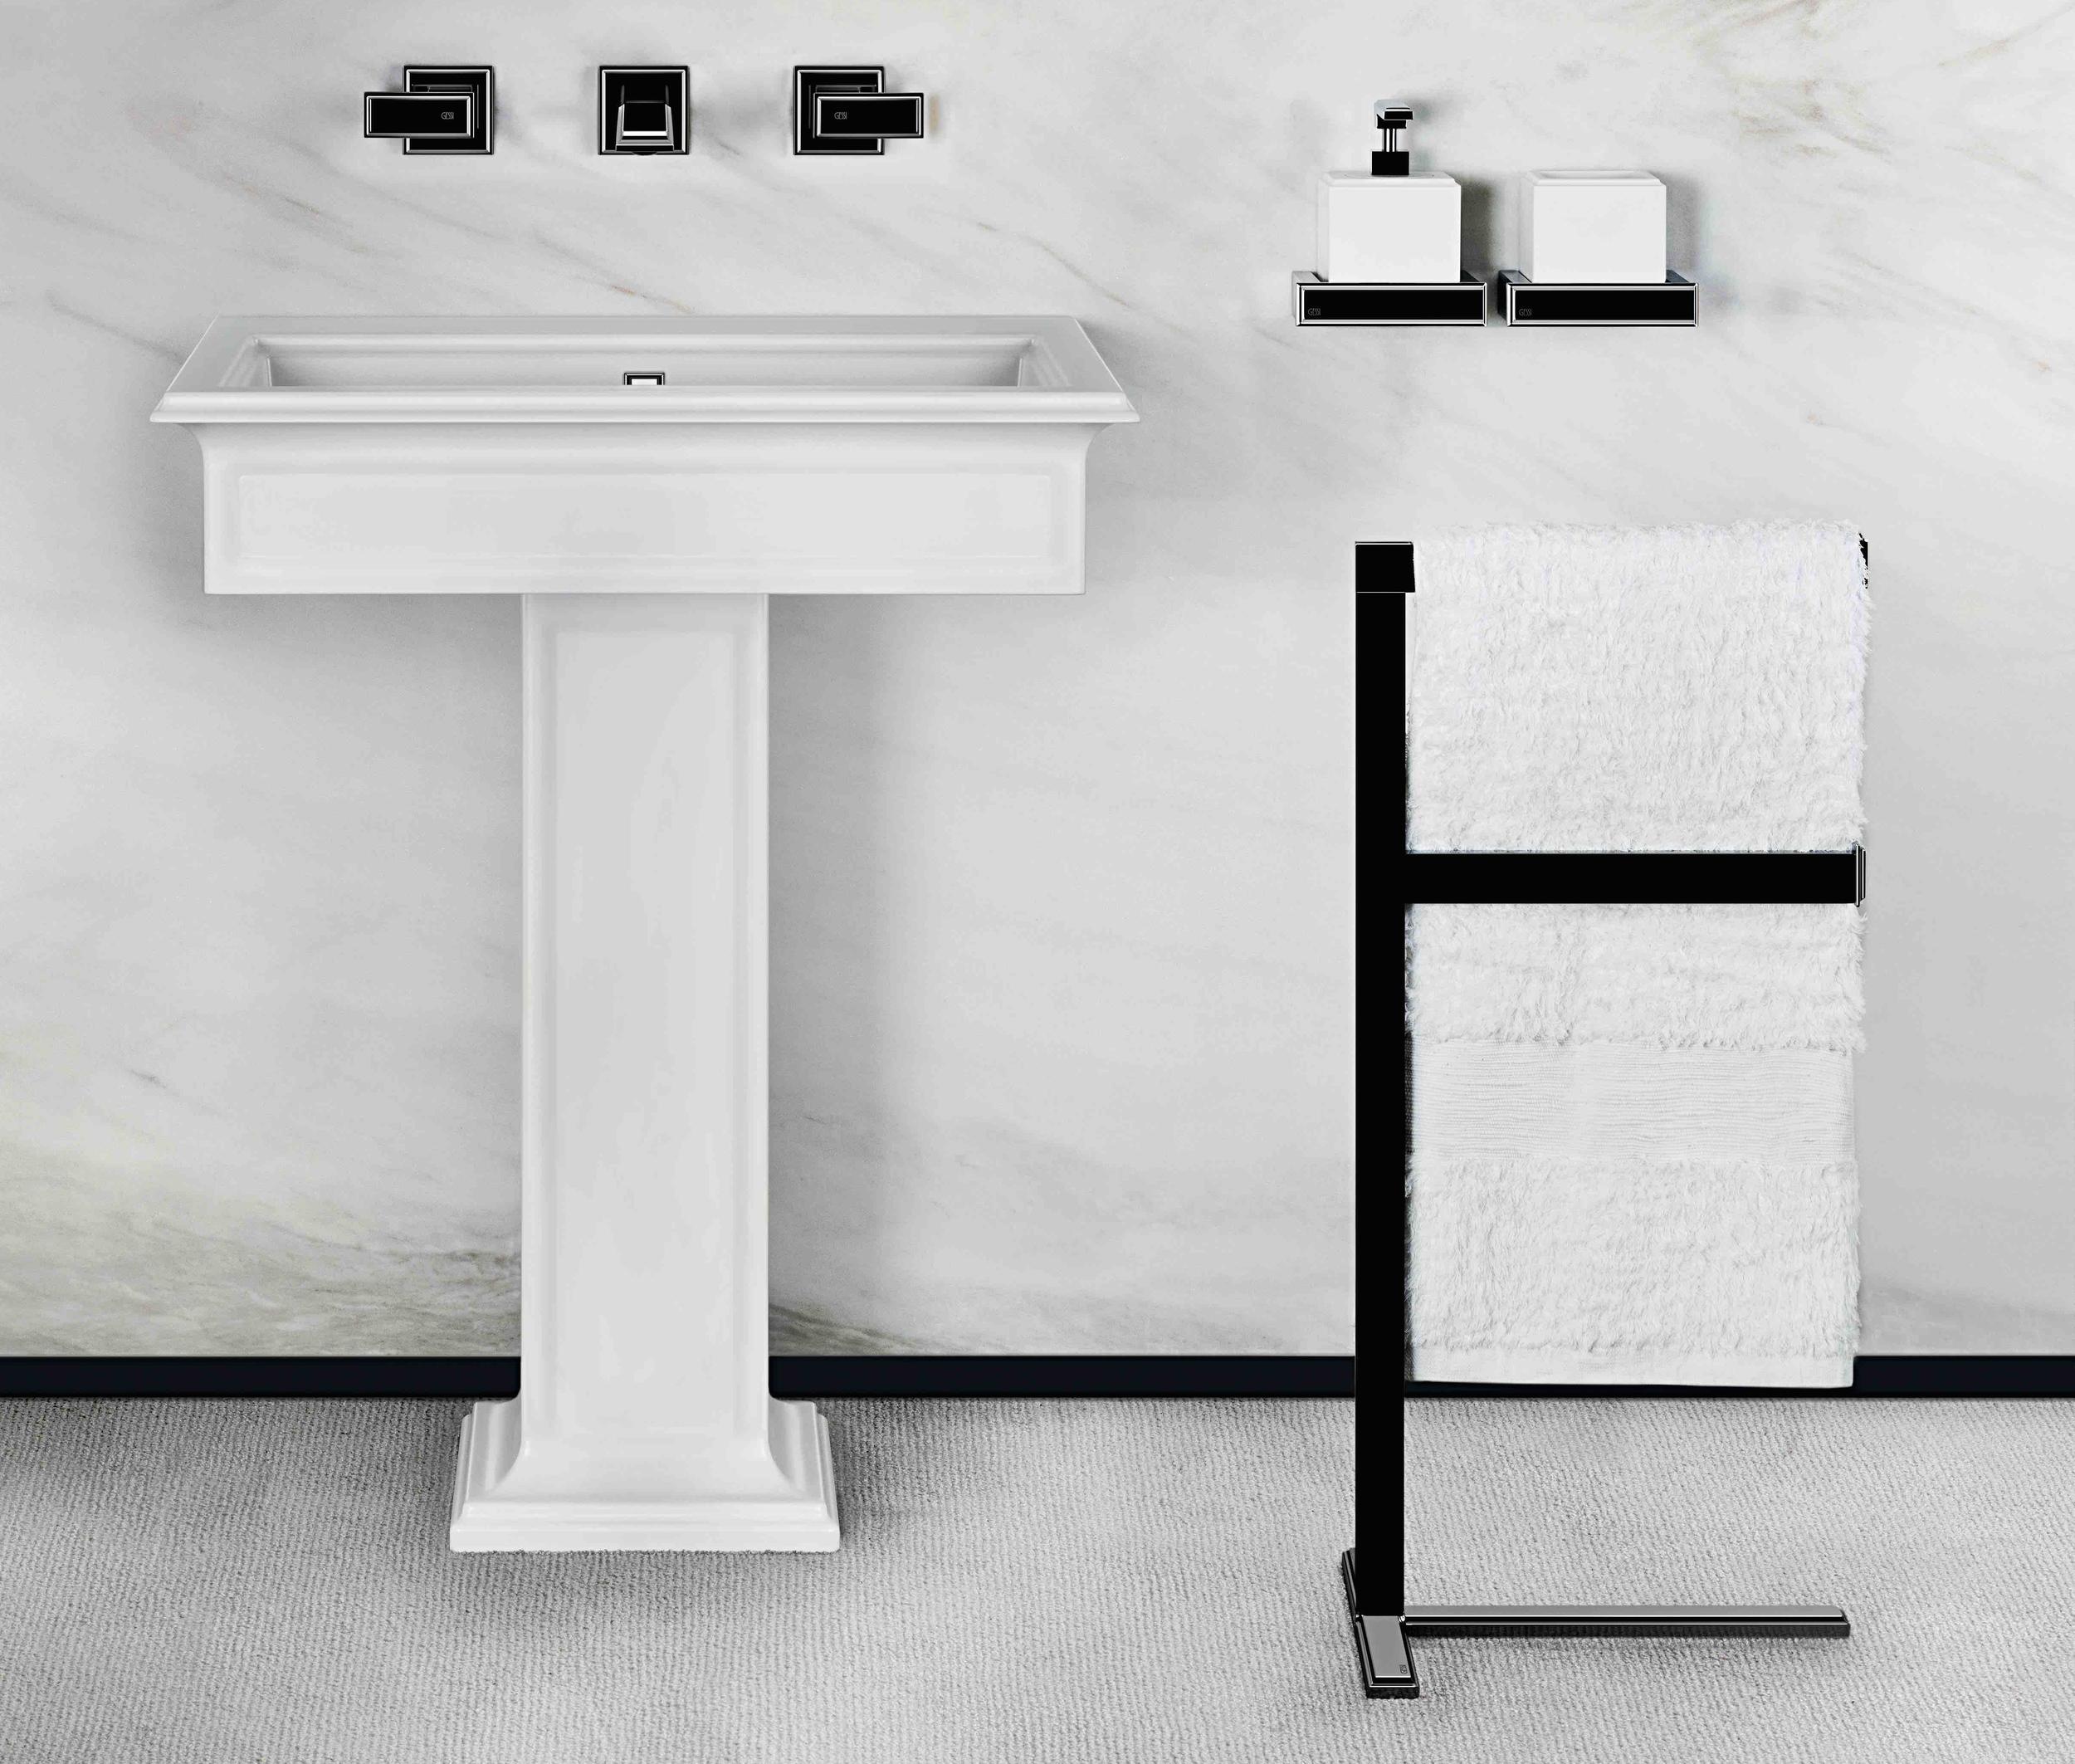 Fascino Gessi pedestal lav, towel bar and accessories.jpg